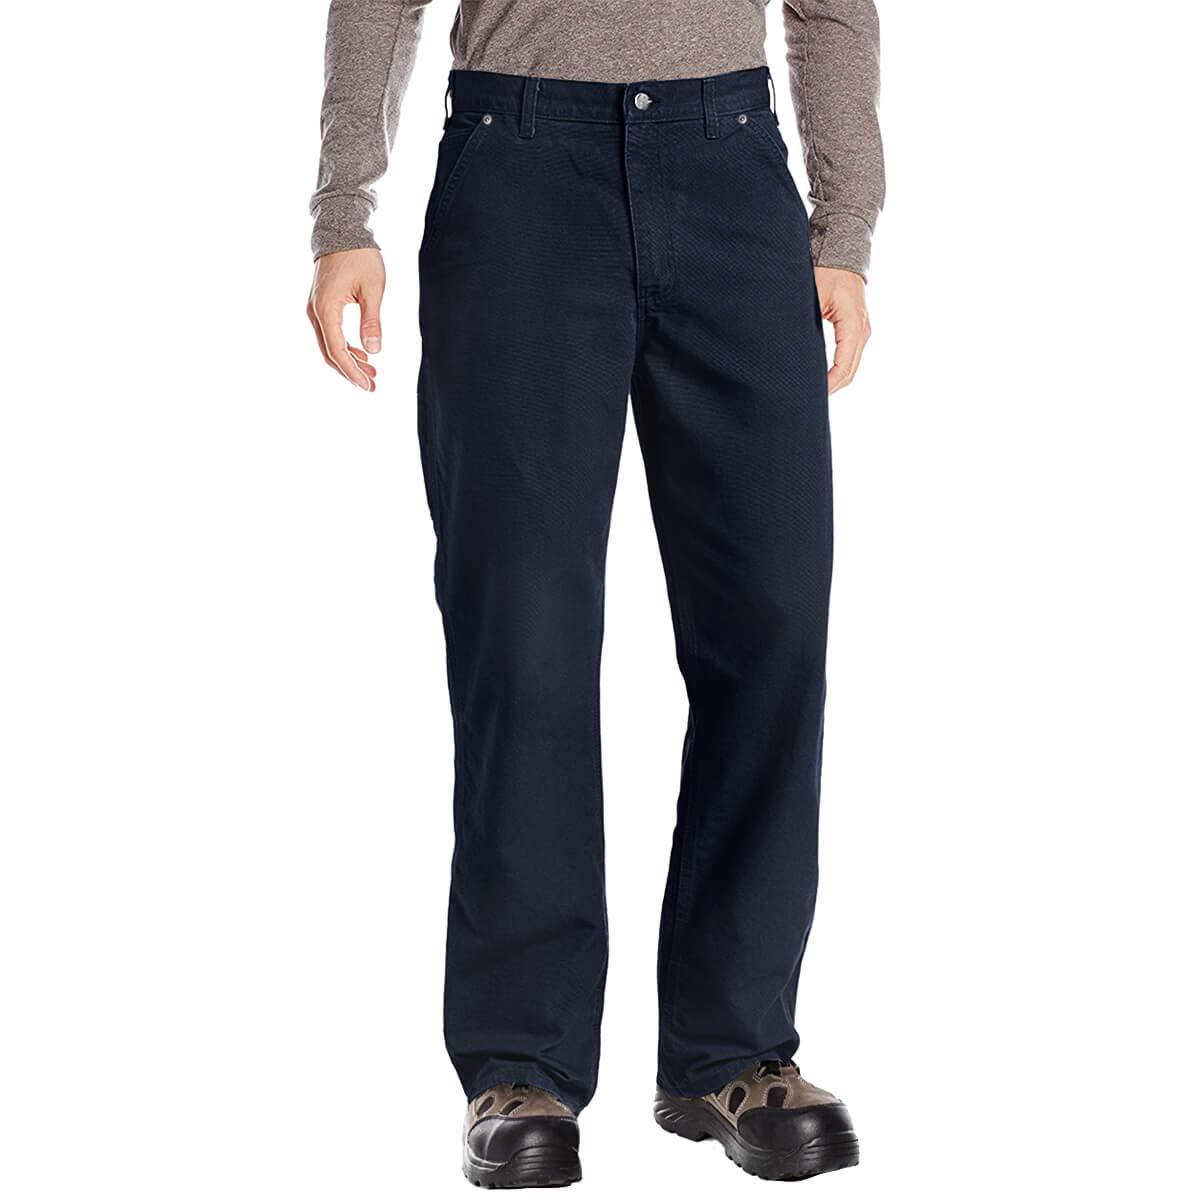 DuraDrive Men's Loose Fit Garment Washed Duck Canvas Work Dungaree Carpenter Pants